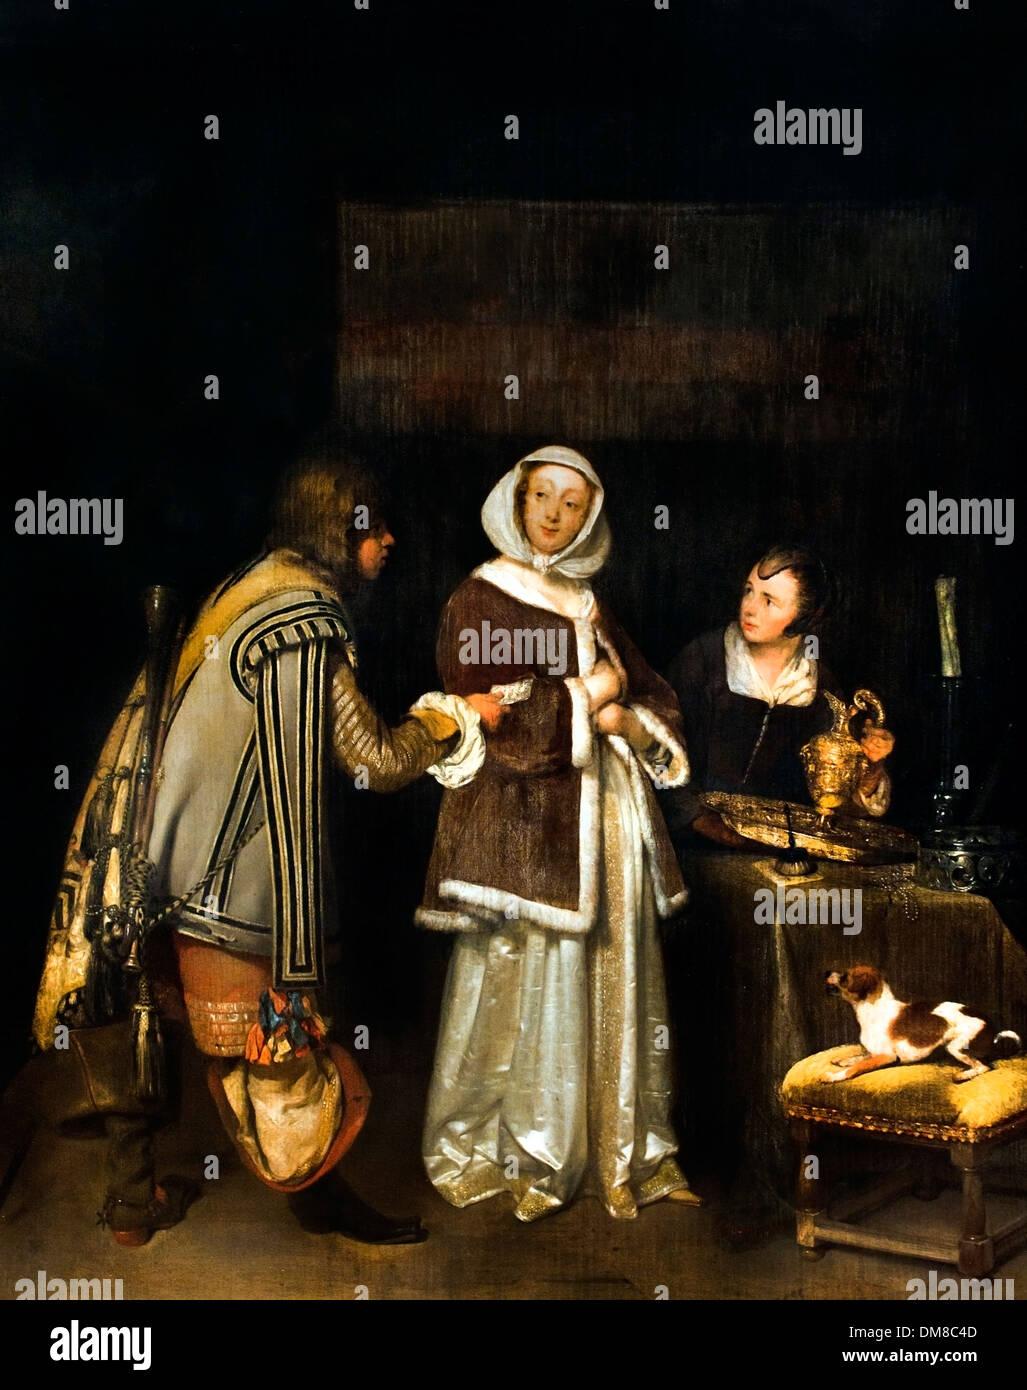 La Carta de 1655 Gerard Ter Borch (1617-1681) Holanda Holandesa Foto de stock